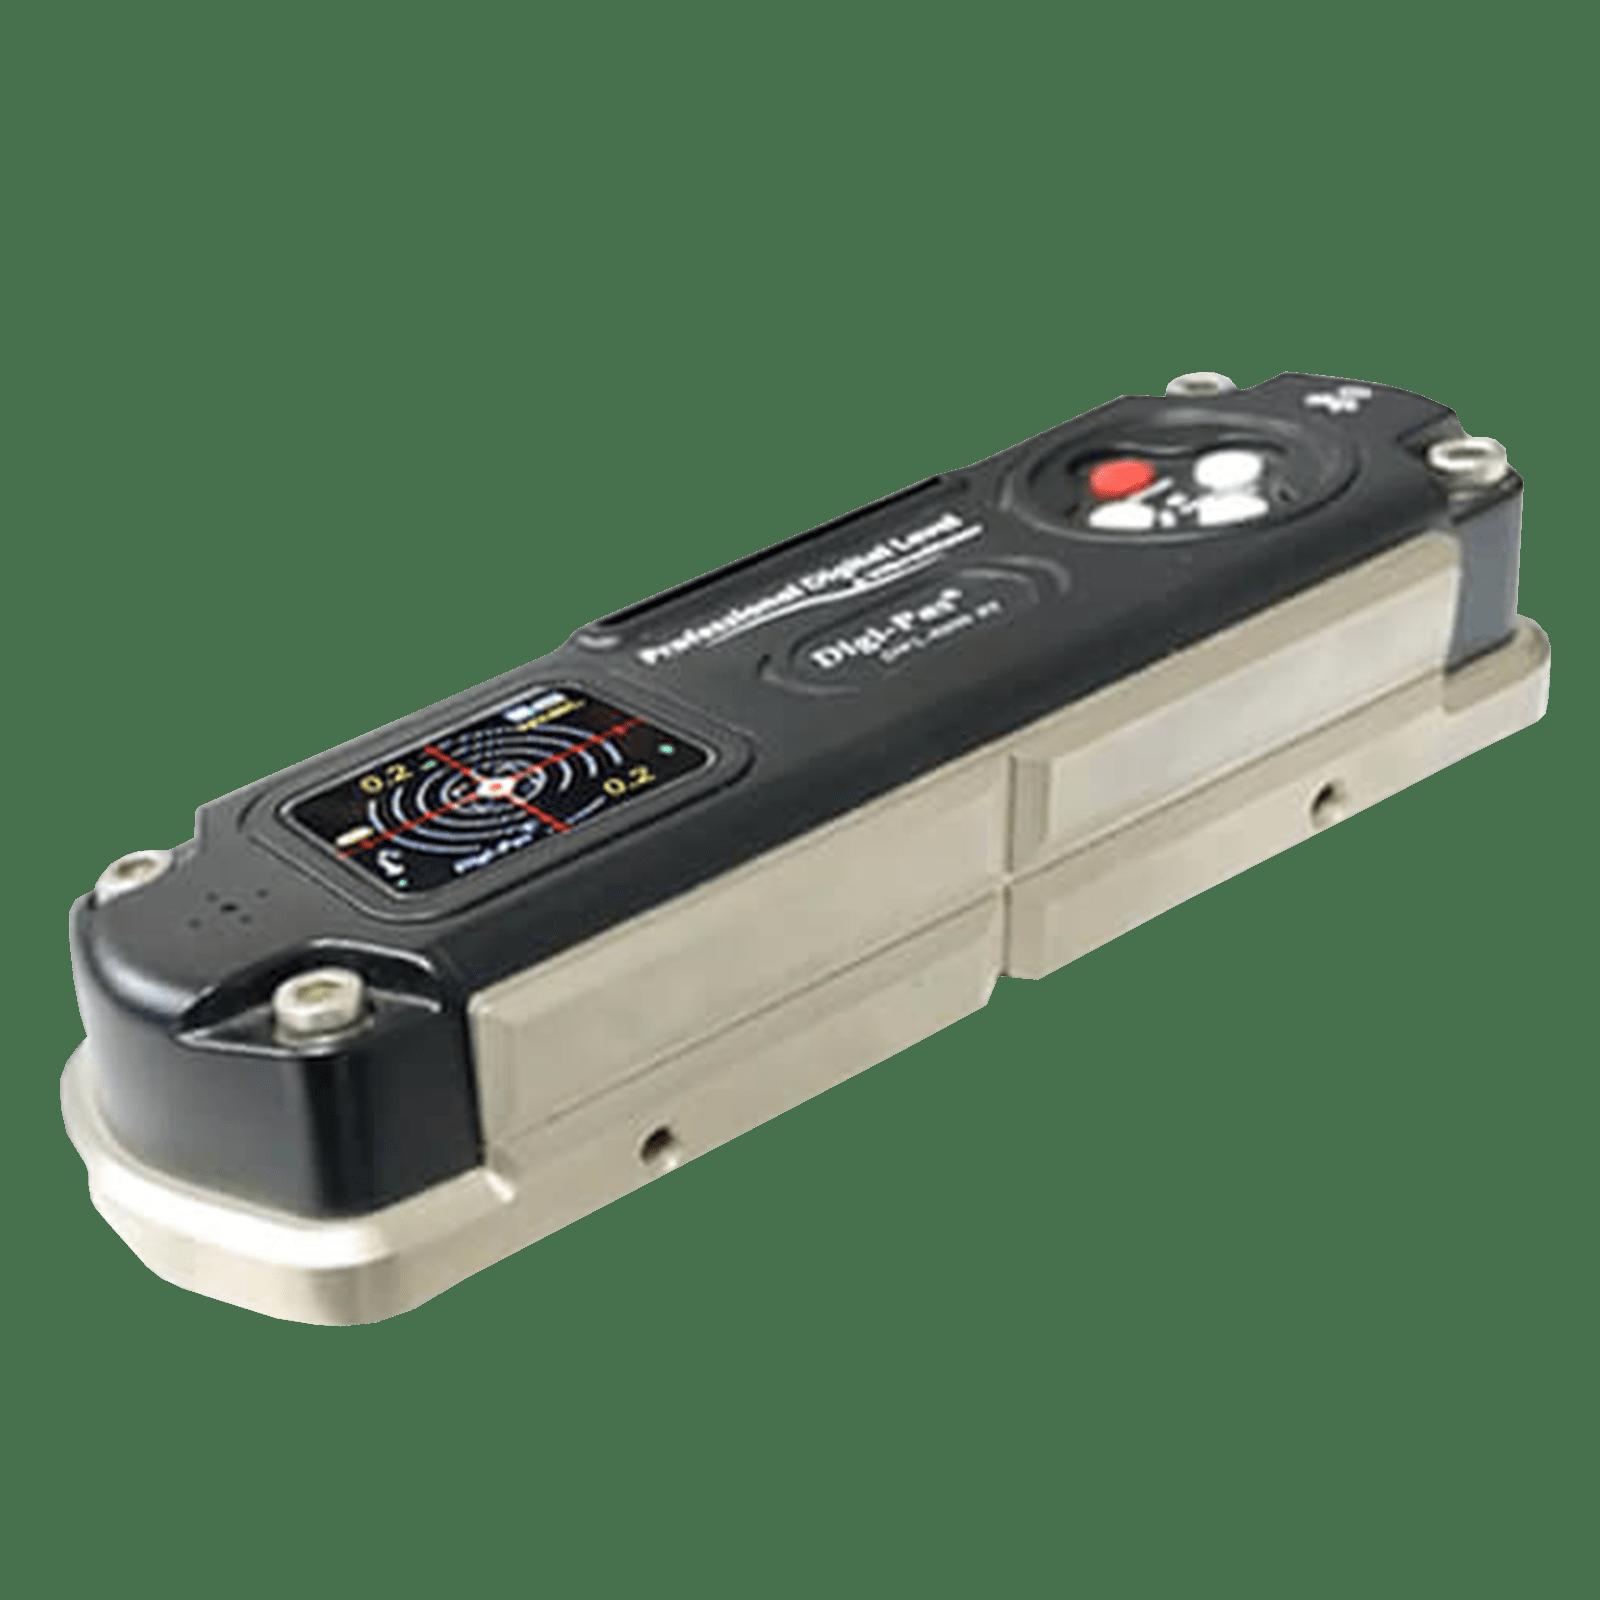 Digi-Pas 9000XY BT digitale Wasserwaage